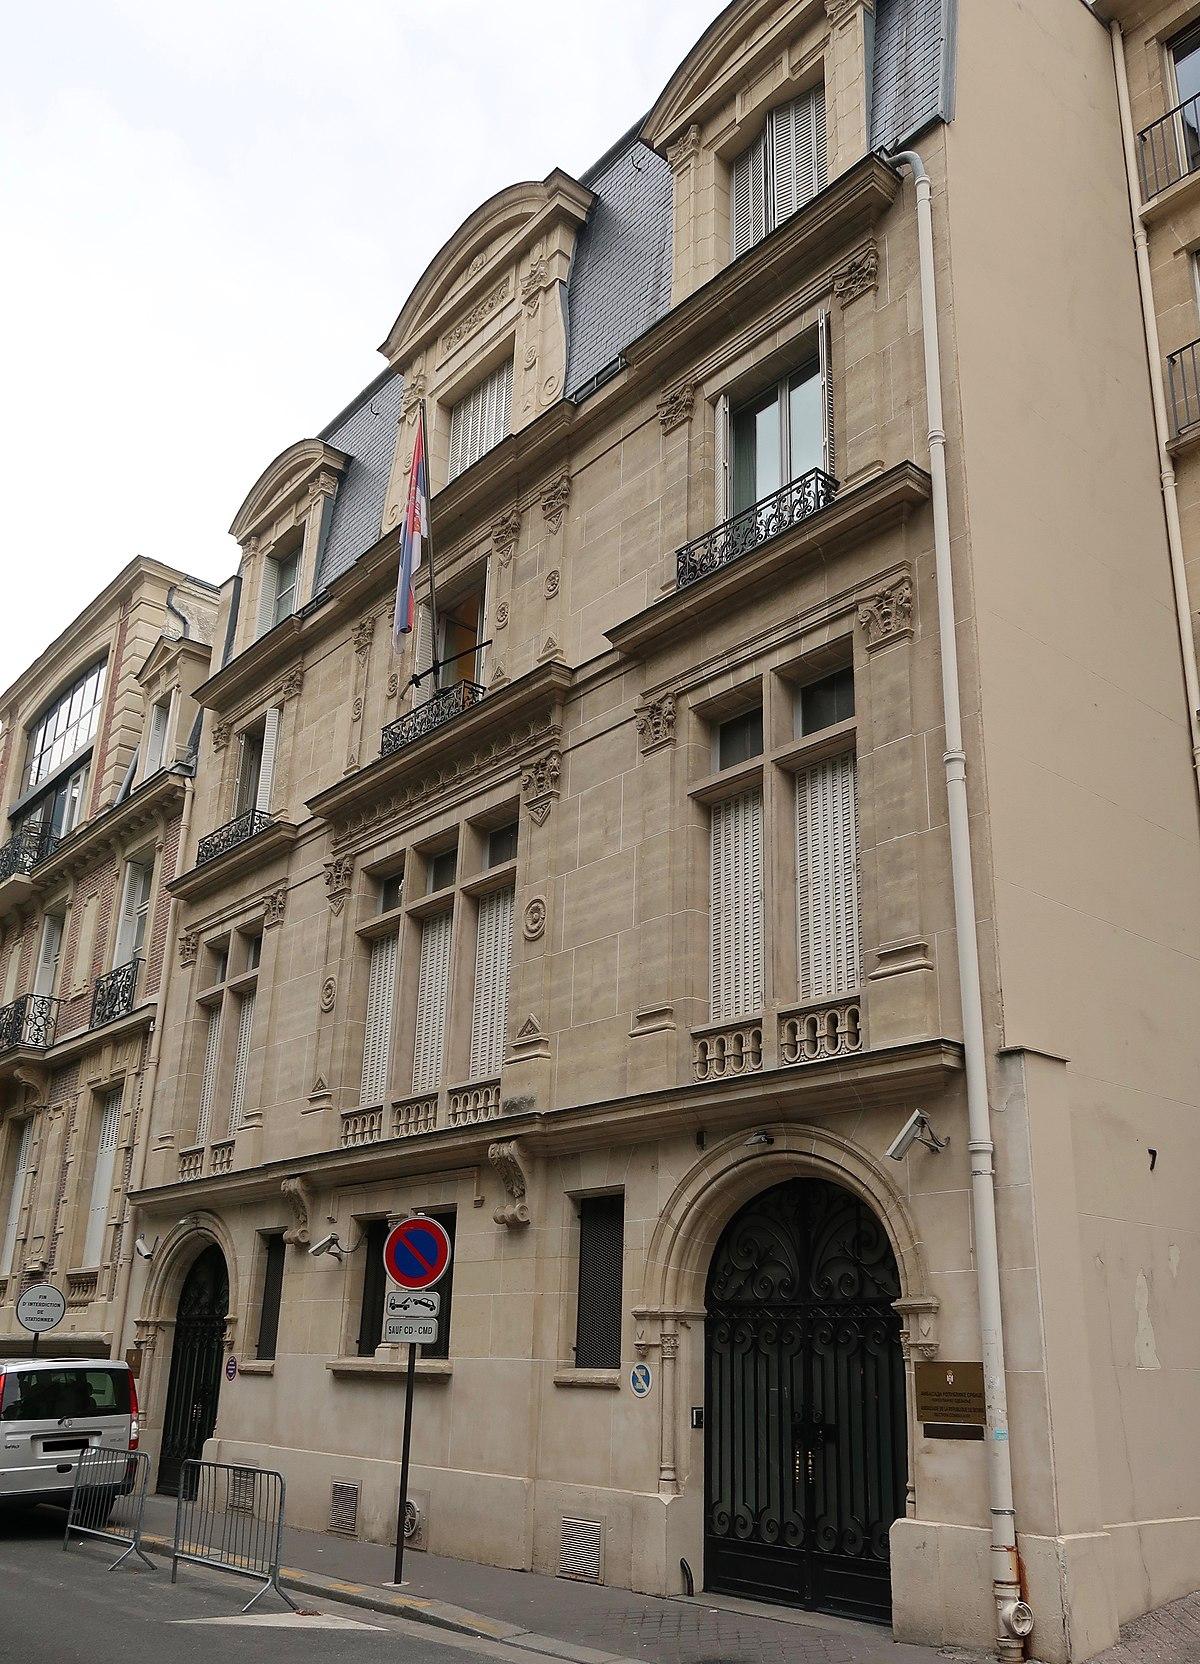 ambassade de serbie en france  u2014 wikip u00e9dia